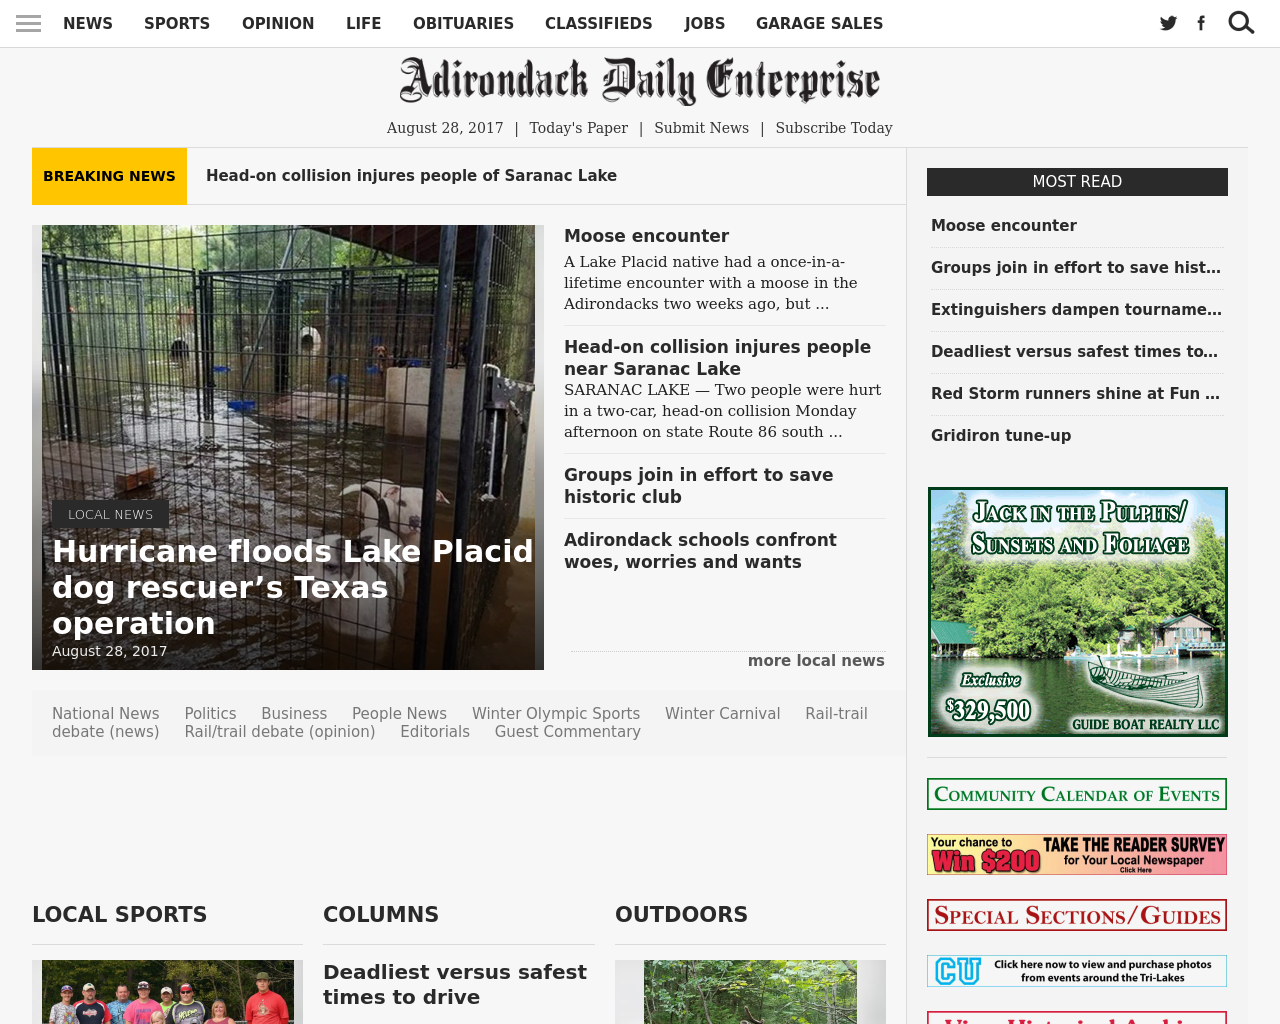 Adirondack-Daily-Enterprise-Advertising-Reviews-Pricing